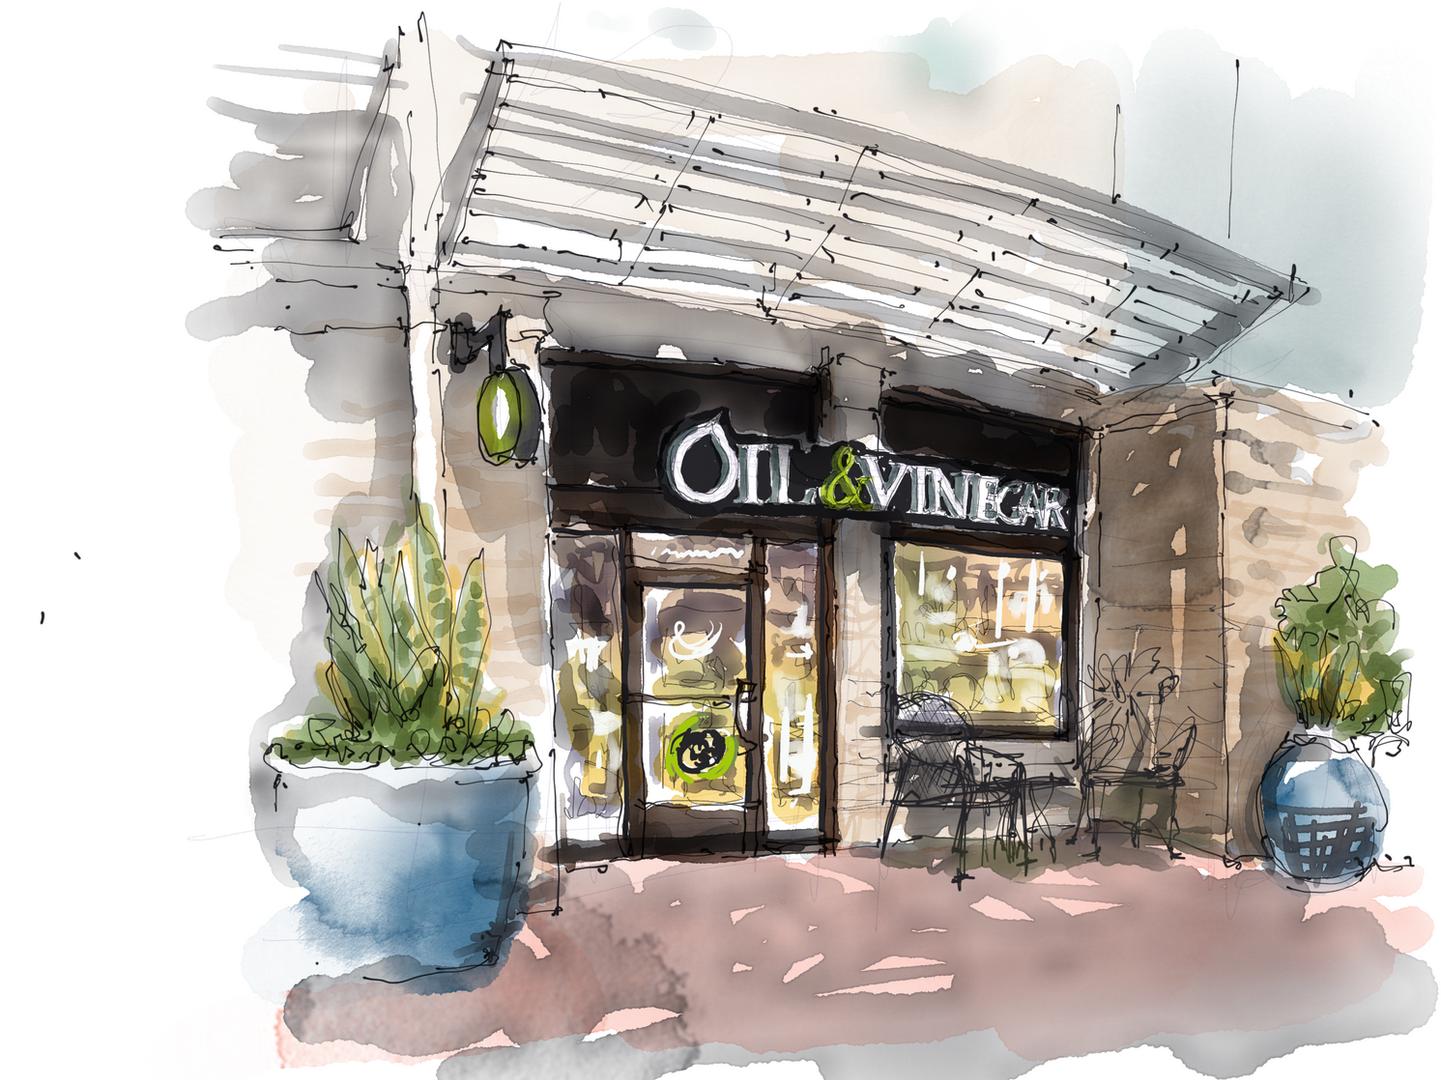 Oil & Vinegar, Plano, TX